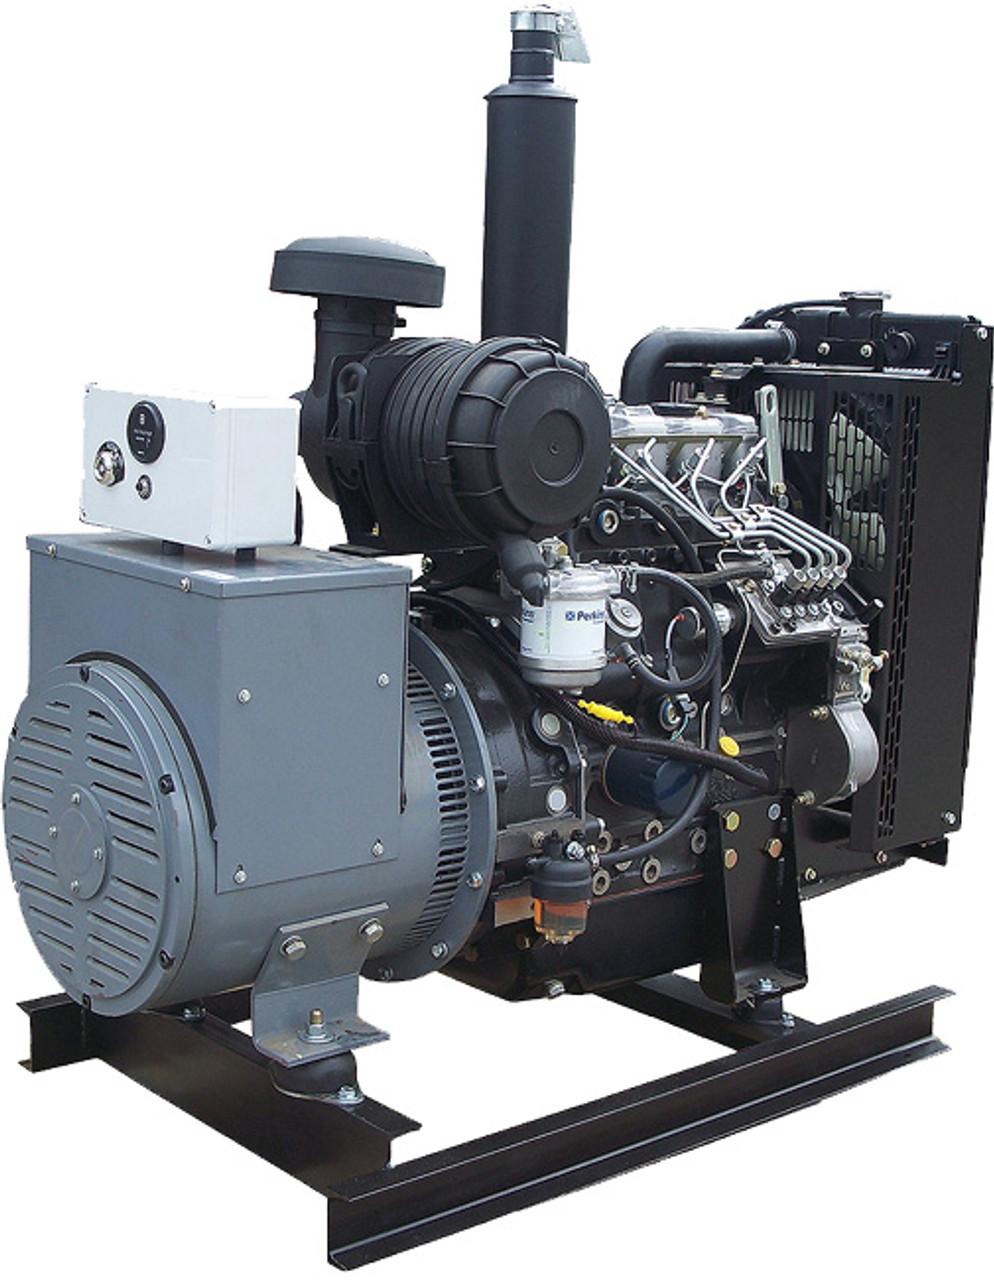 Spray Rig Generators   21kW 4-Cylinder Diesel Generator